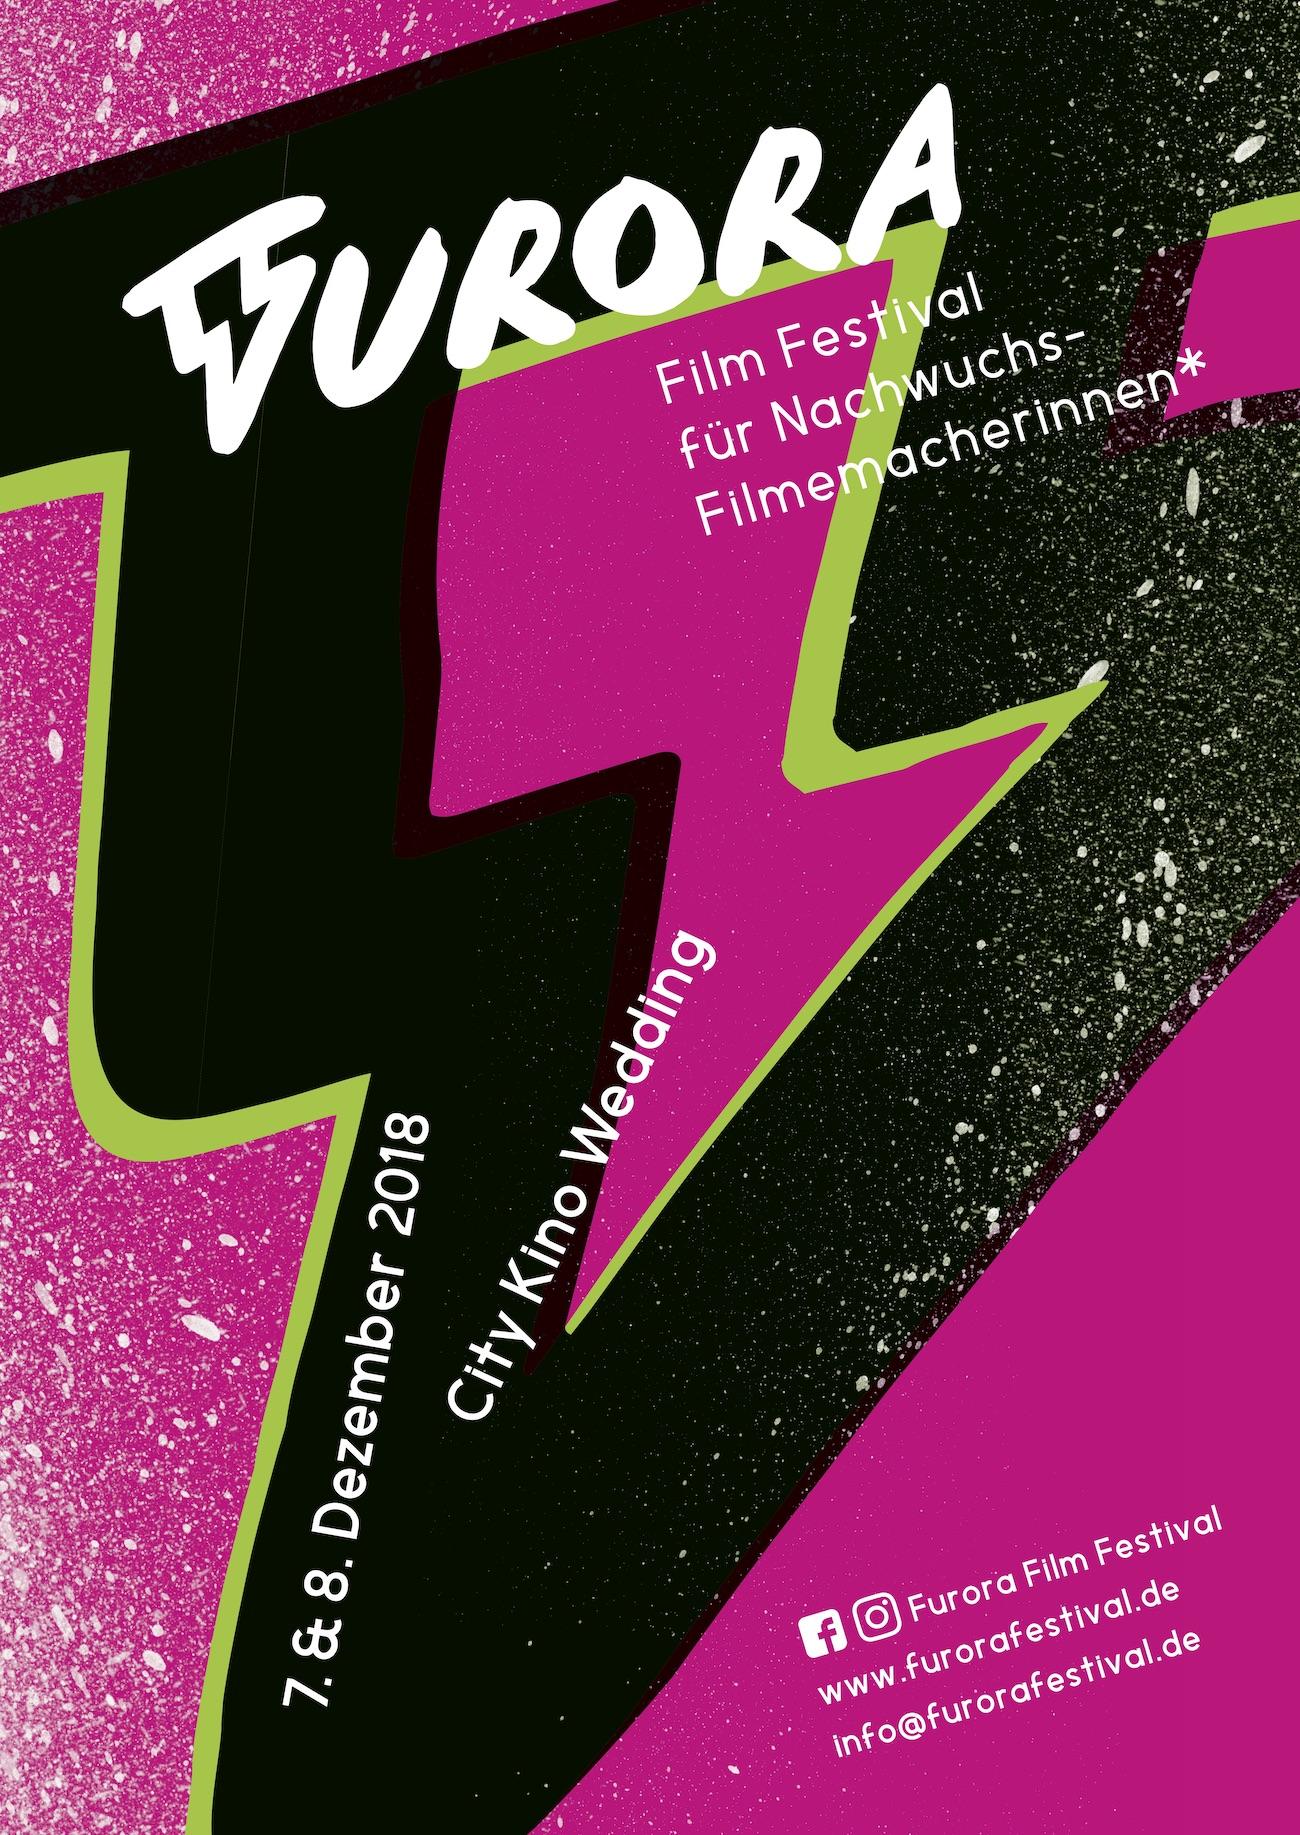 Plakat Furora Film Festival, Feminismus, Berlin, 030, Magazin, 030magazin, www.berlin030.de, film